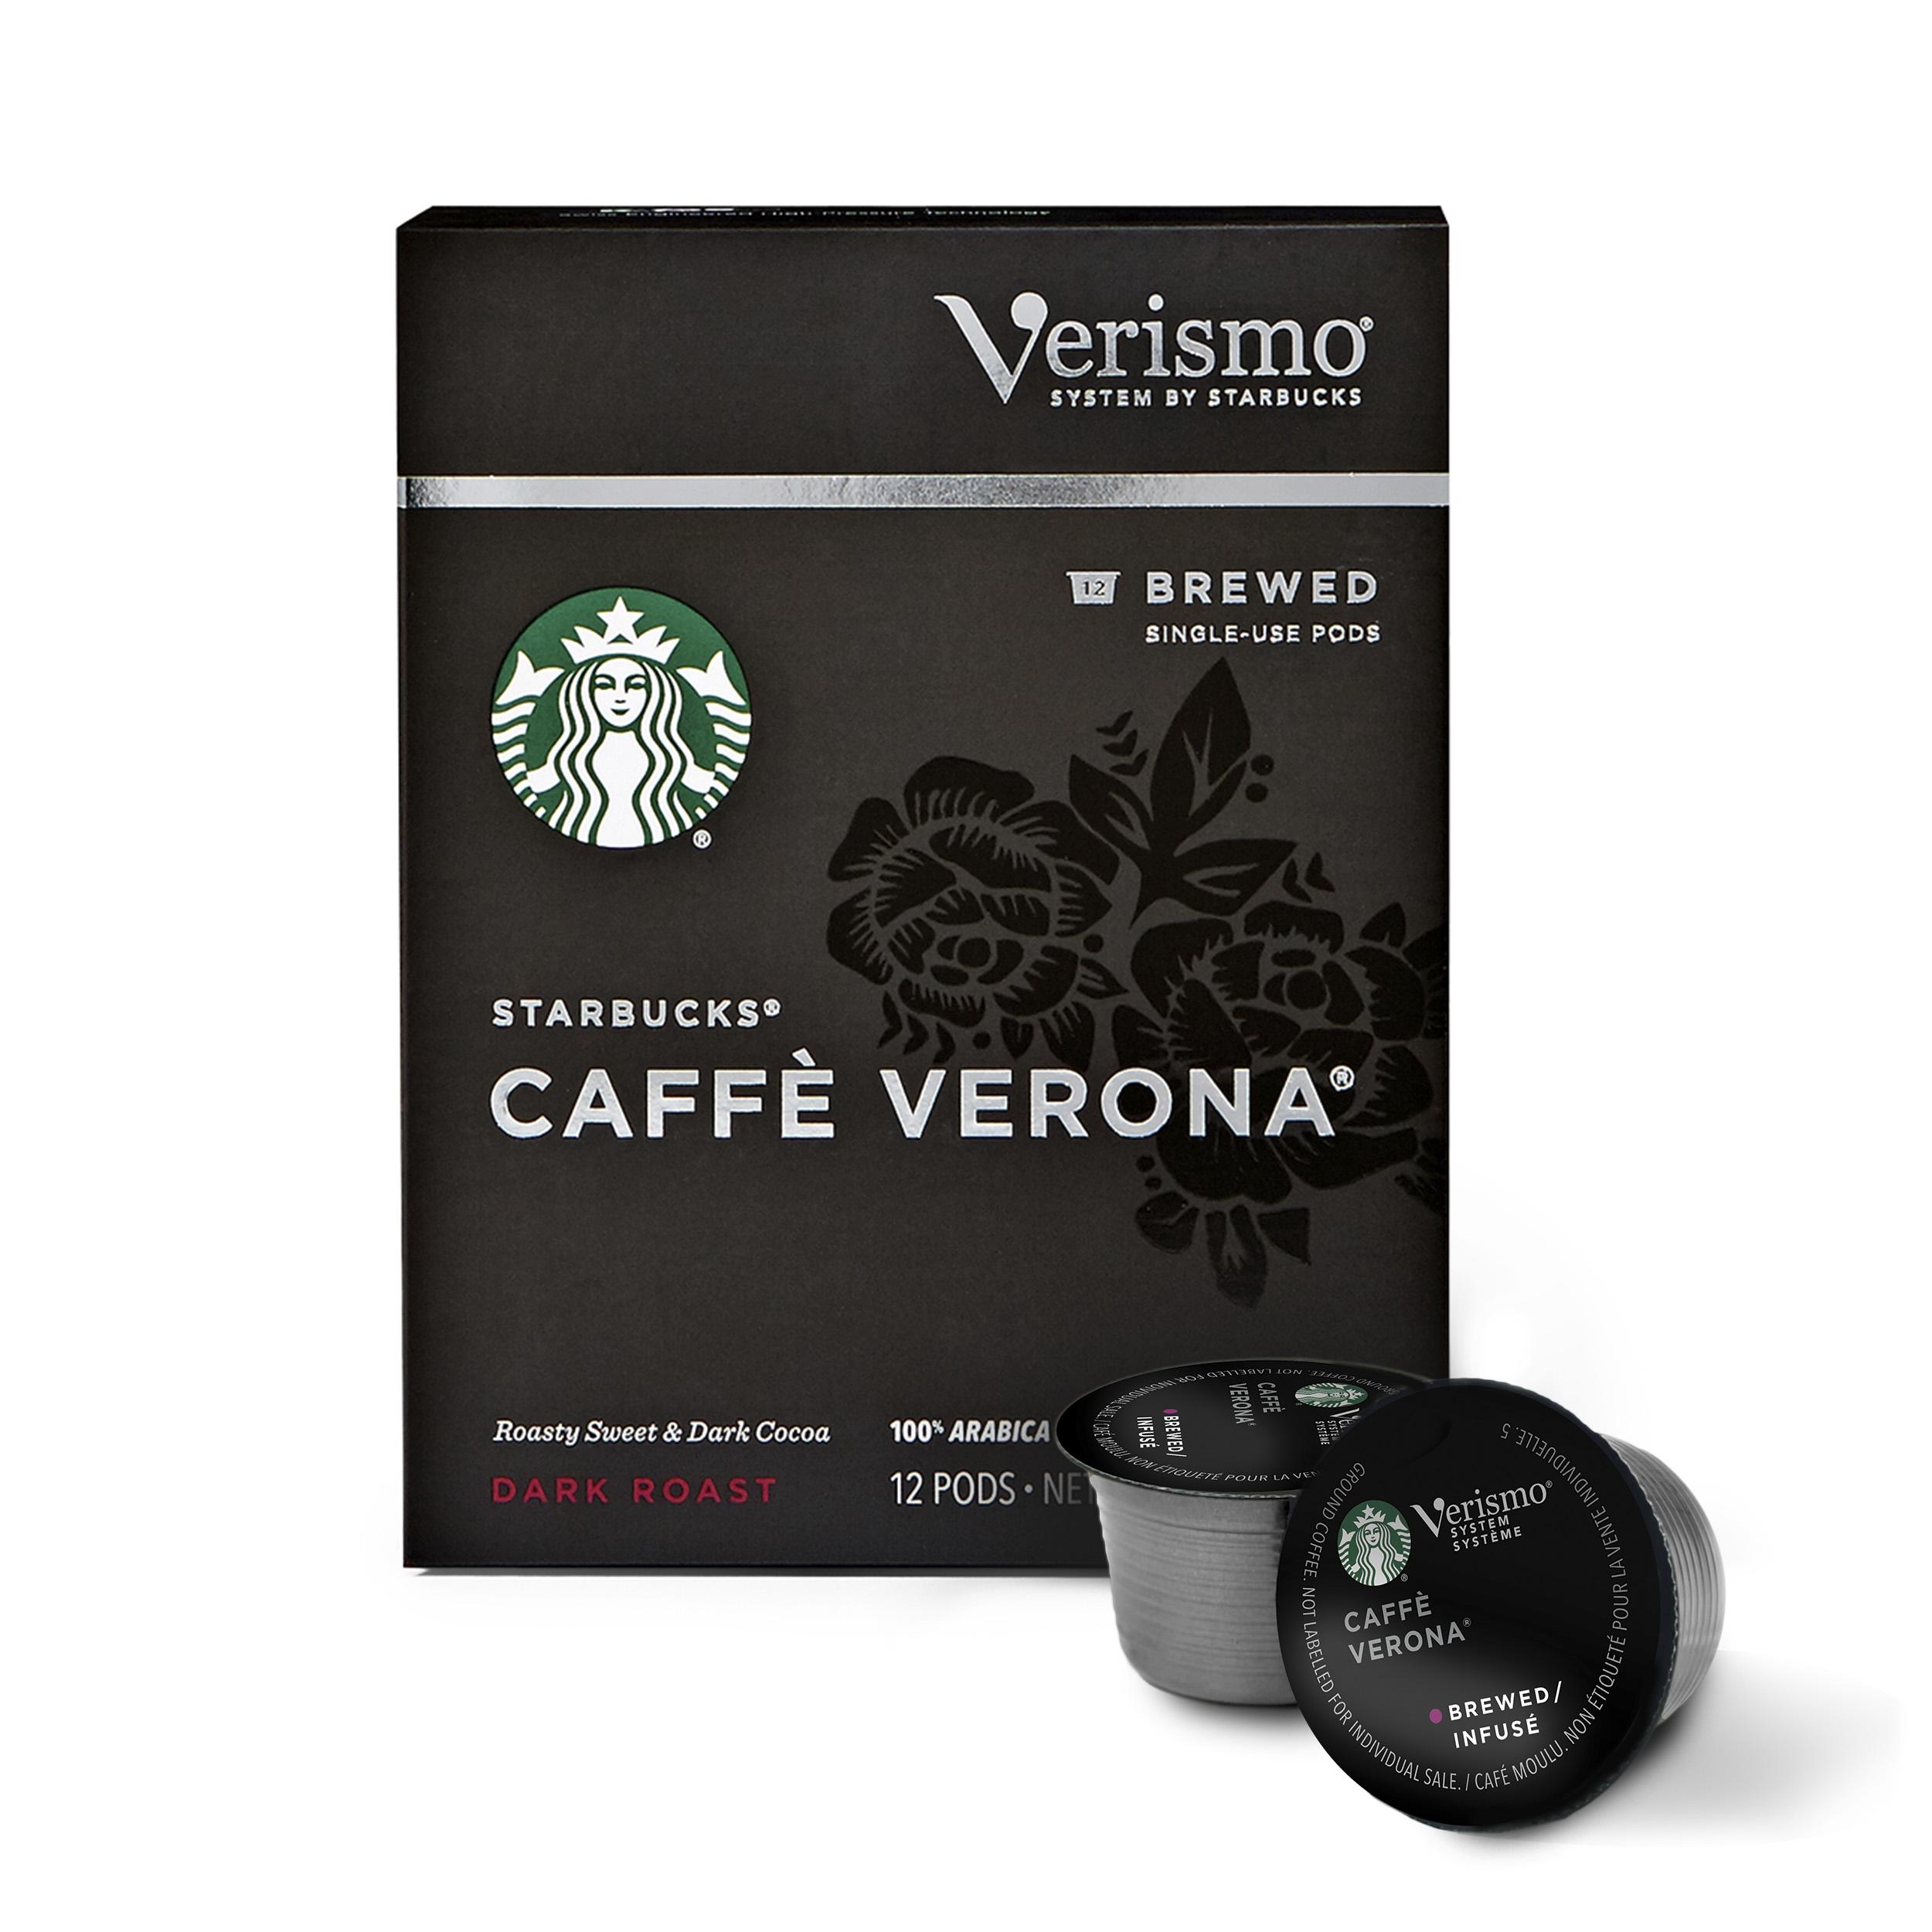 Starbucks Verismo Caffe Verona Brewed Coffee Single Serve Verismo Pods, Dark Roast, 6 boxes of 12 (72 total Verismo pods)